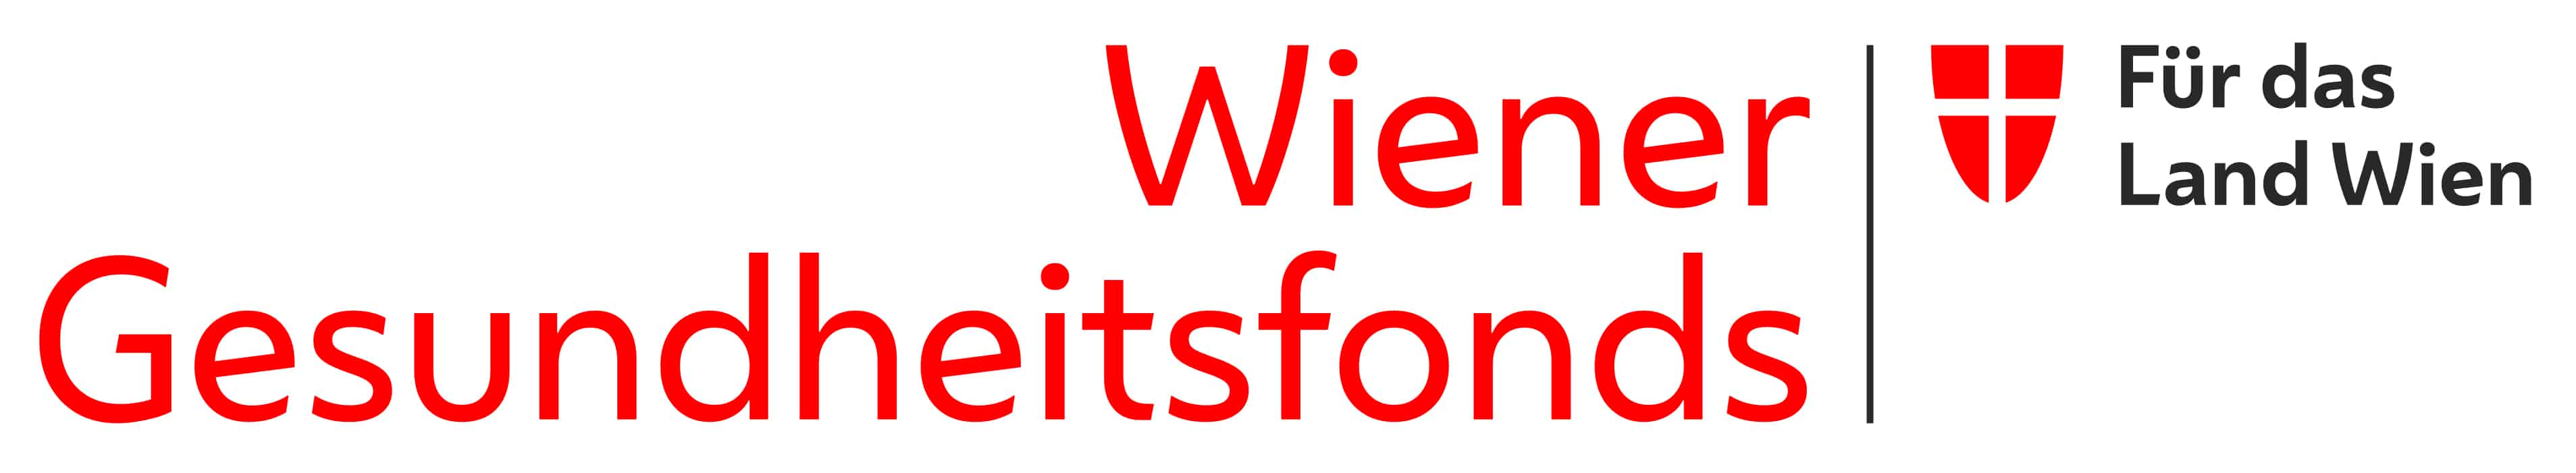 Wiener Gesundheitsfonds